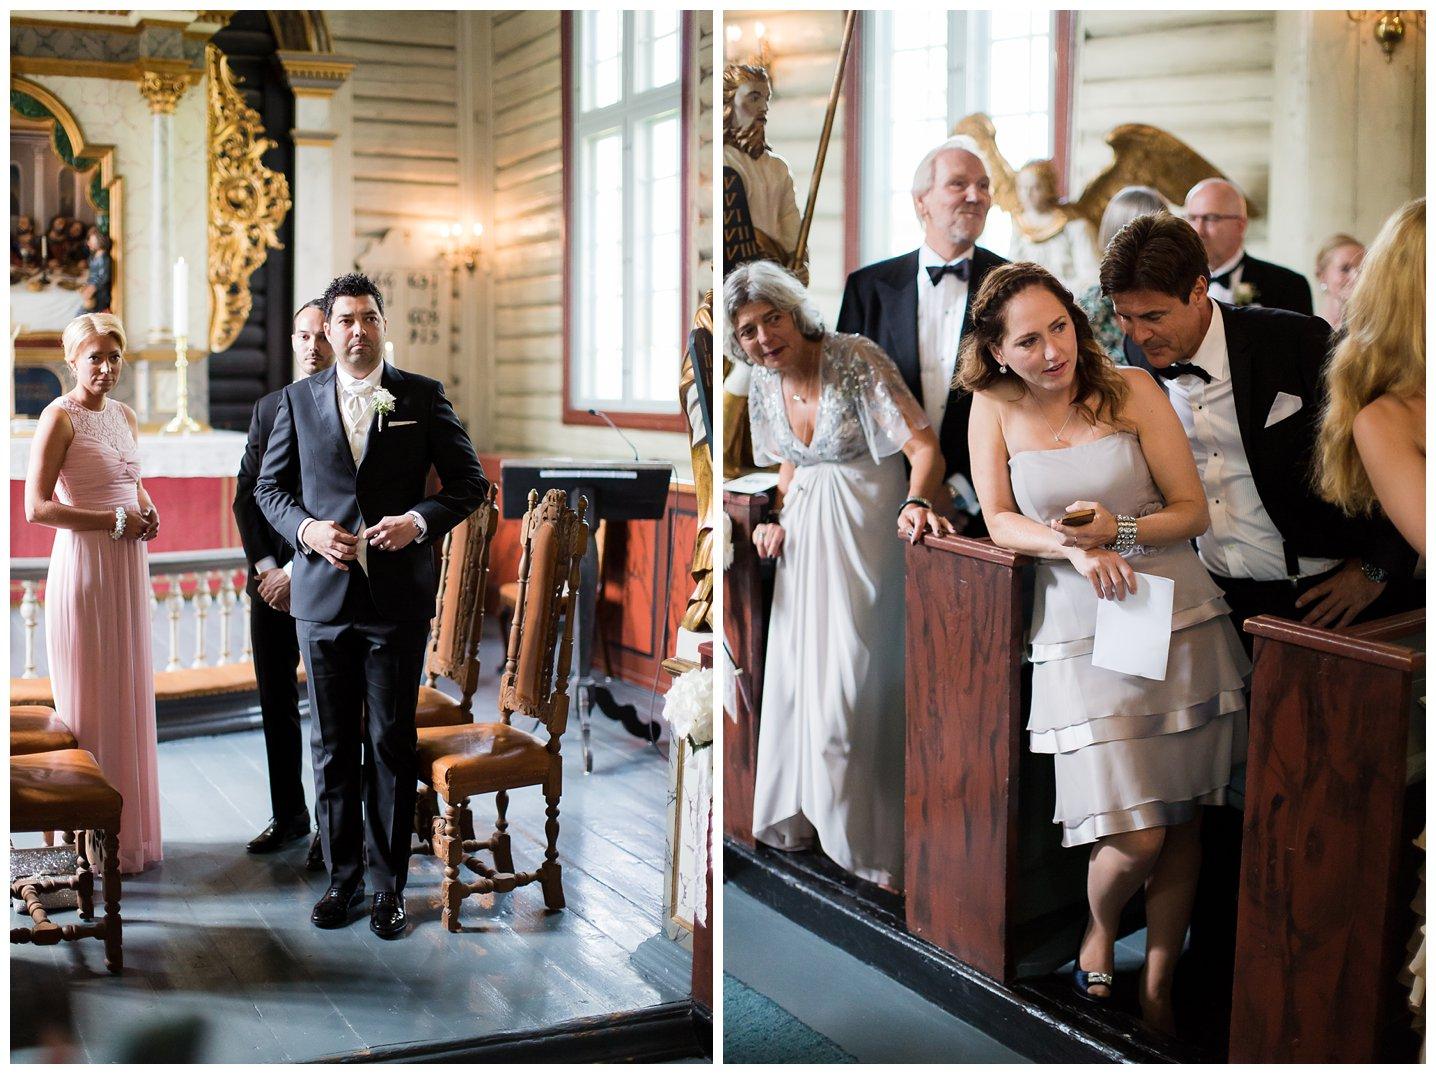 Fotograf-Eline-Jacobine-Bryllup-Villa-Malla-Camilla-og-Alexander_0056